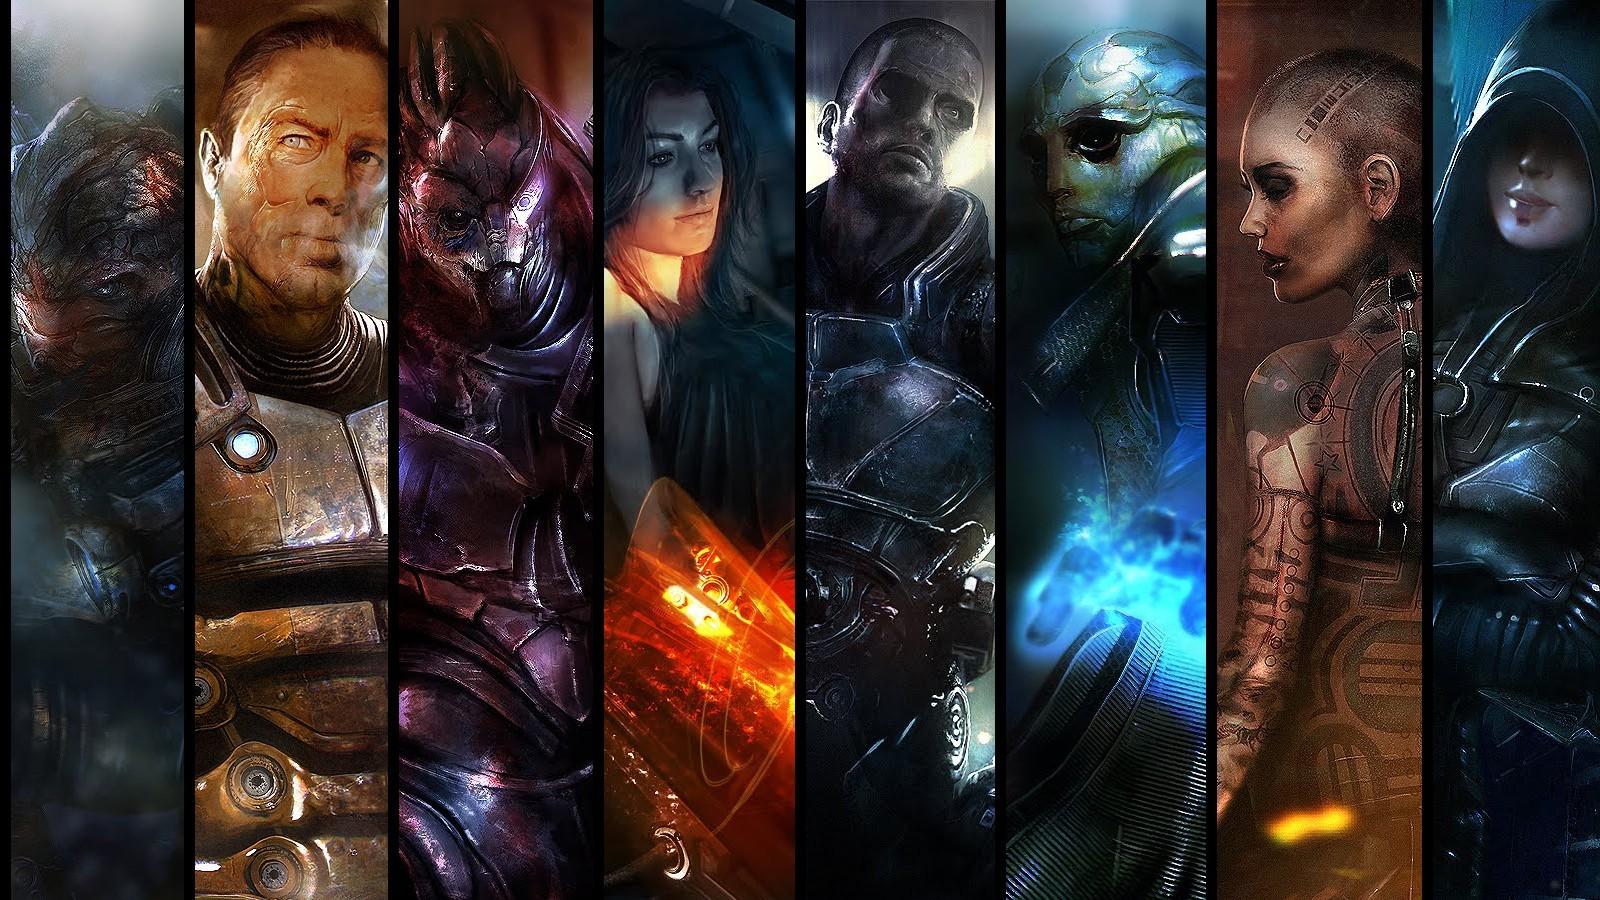 General 1600x900 Mass Effect 2 collage video games video game art video game girls video game man science fiction PC gaming science fiction women Science Fiction Men